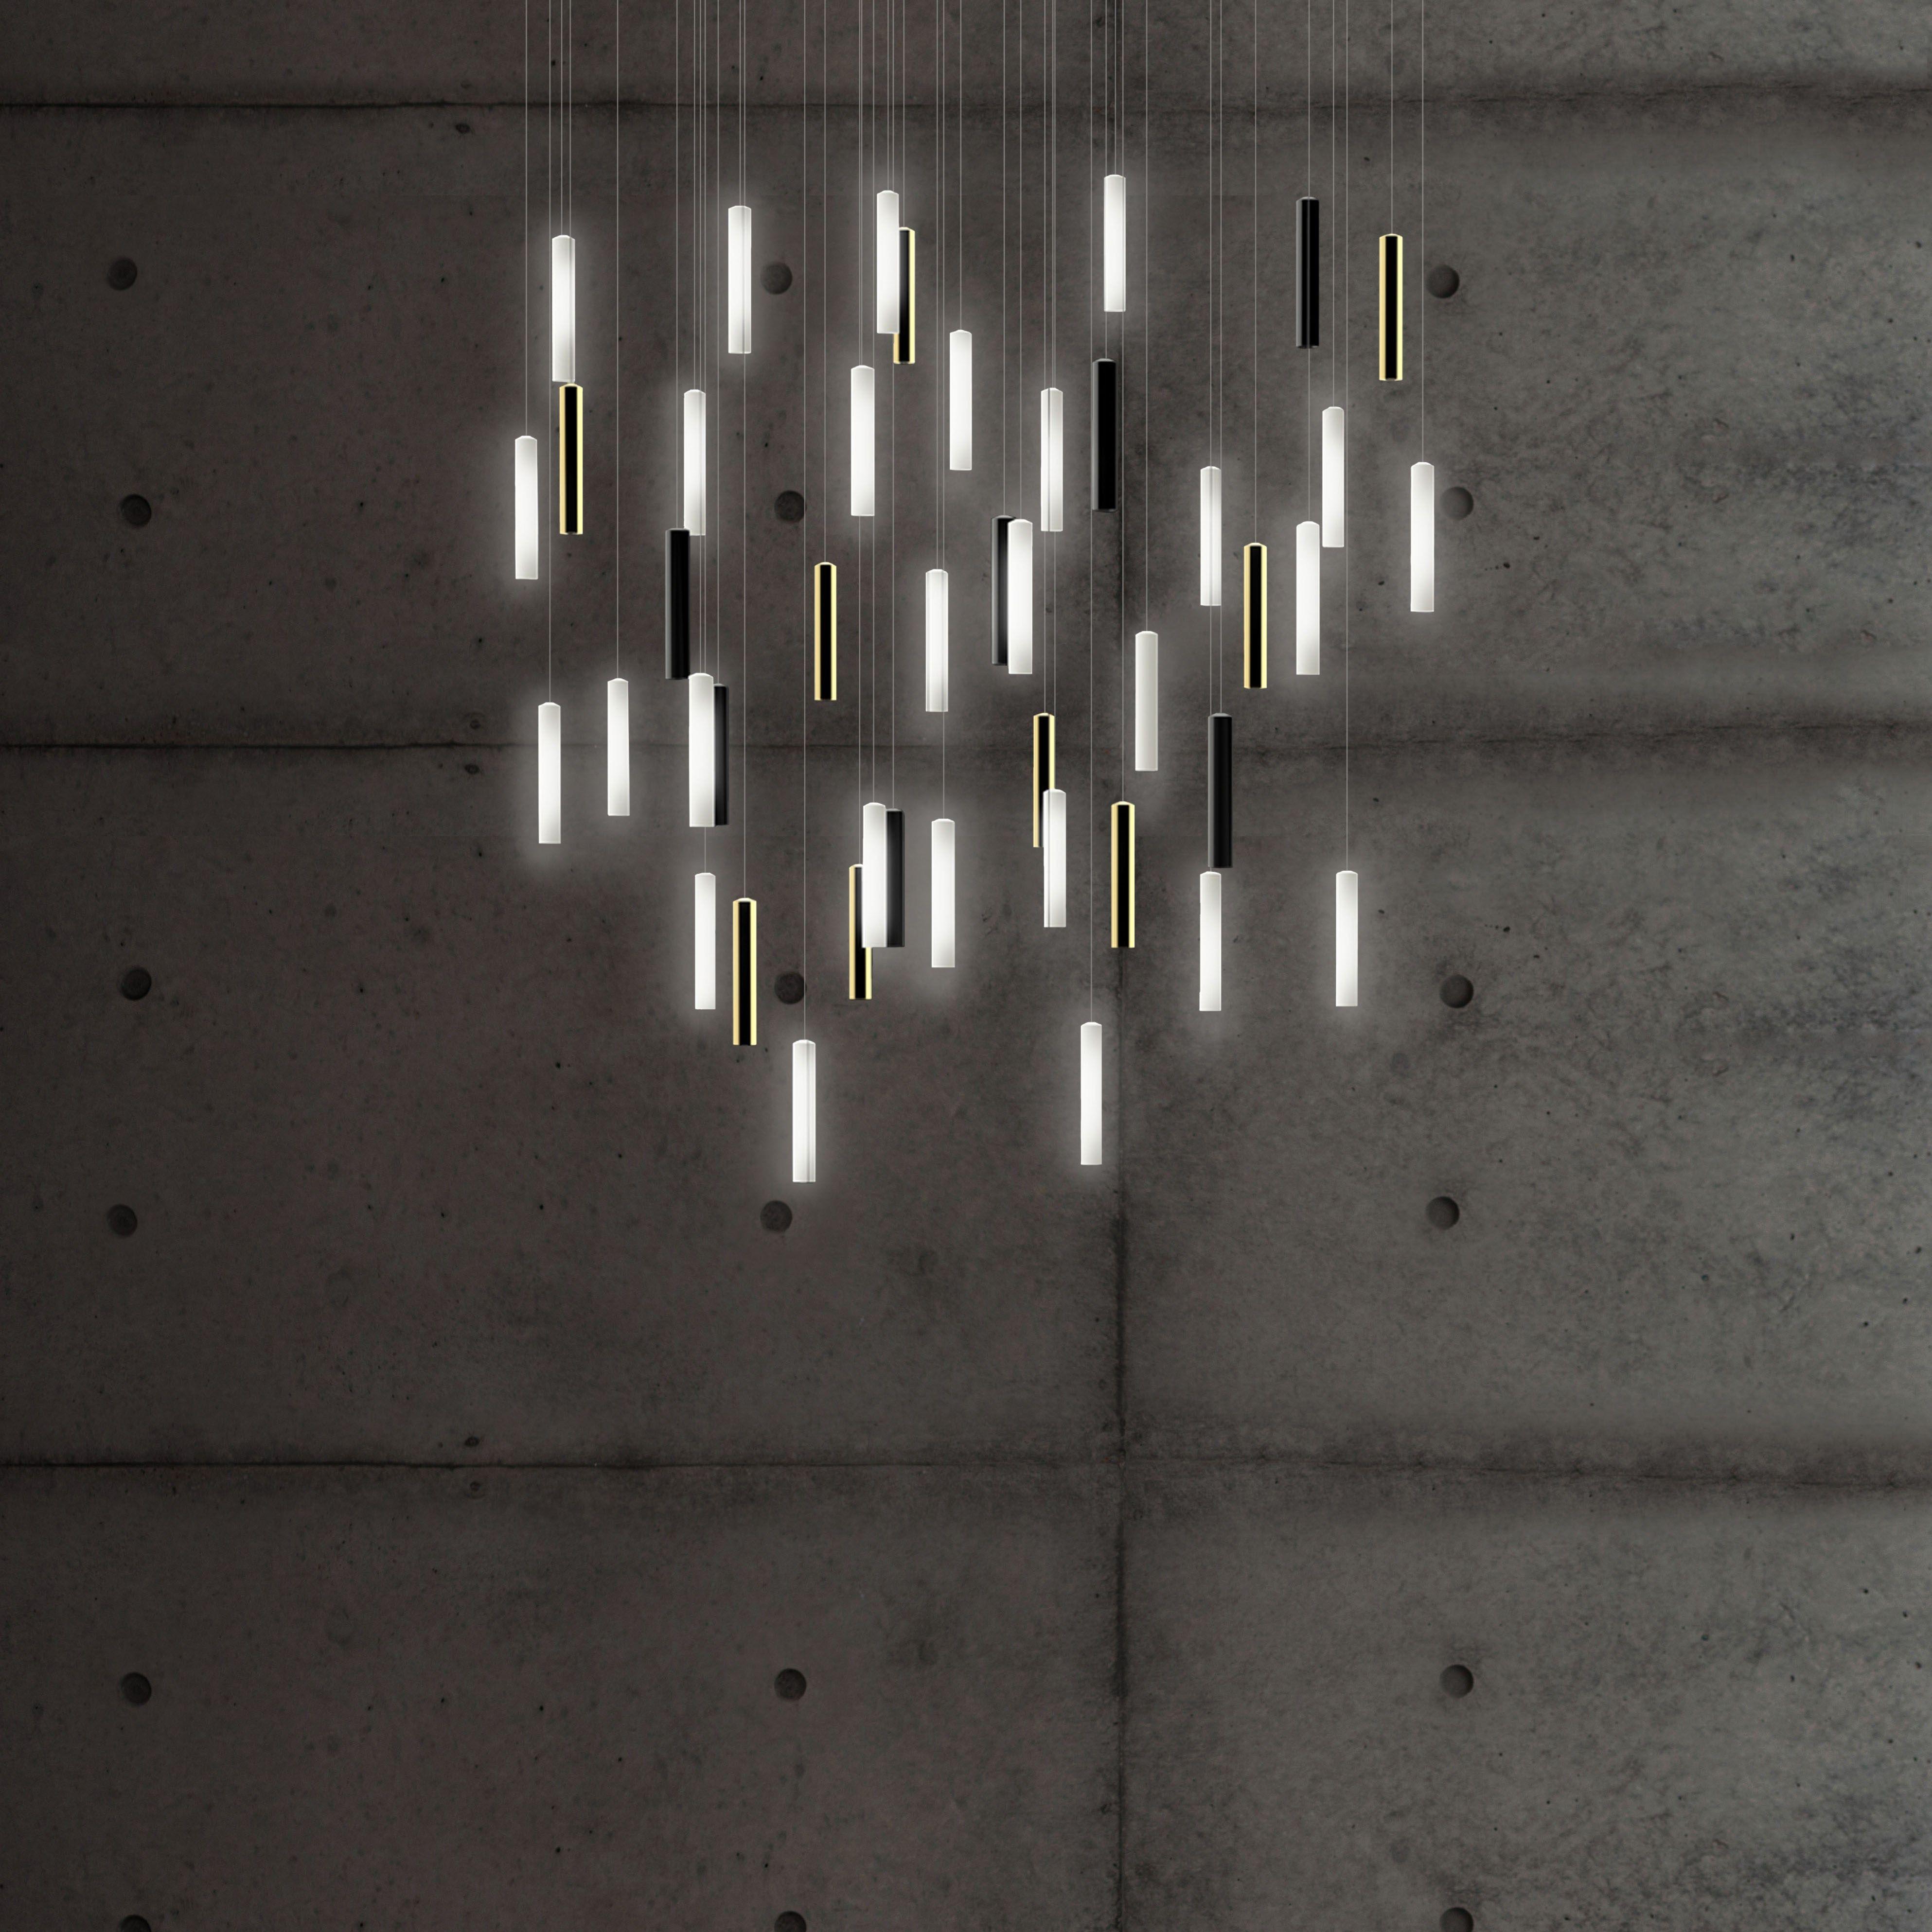 Rainy Day On Demand Beau Bien Light Ceiling Lights Pendant Lamp